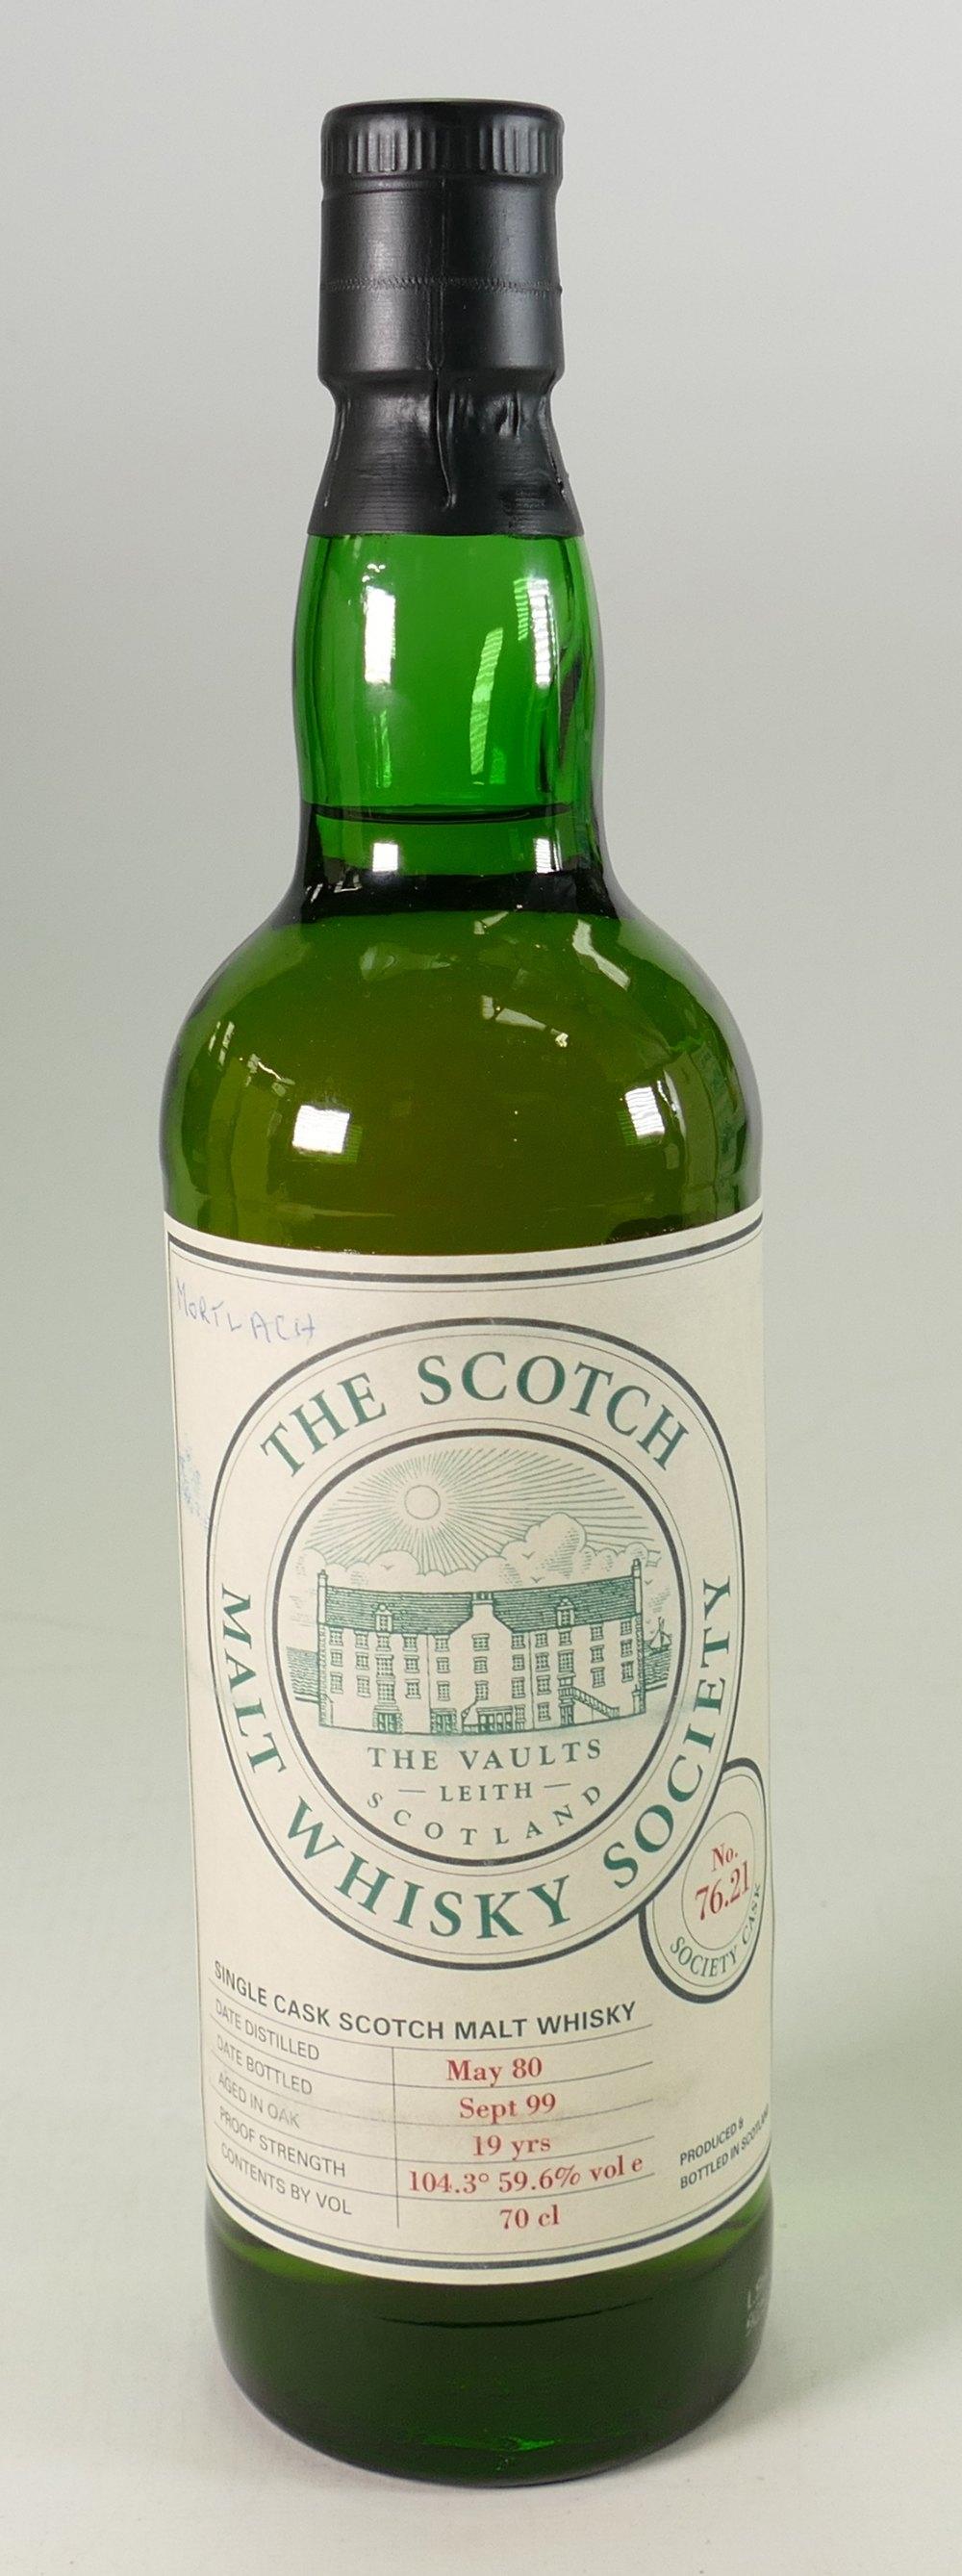 Scotch Malt Whisky Society 19 years Mortlach: 70cl